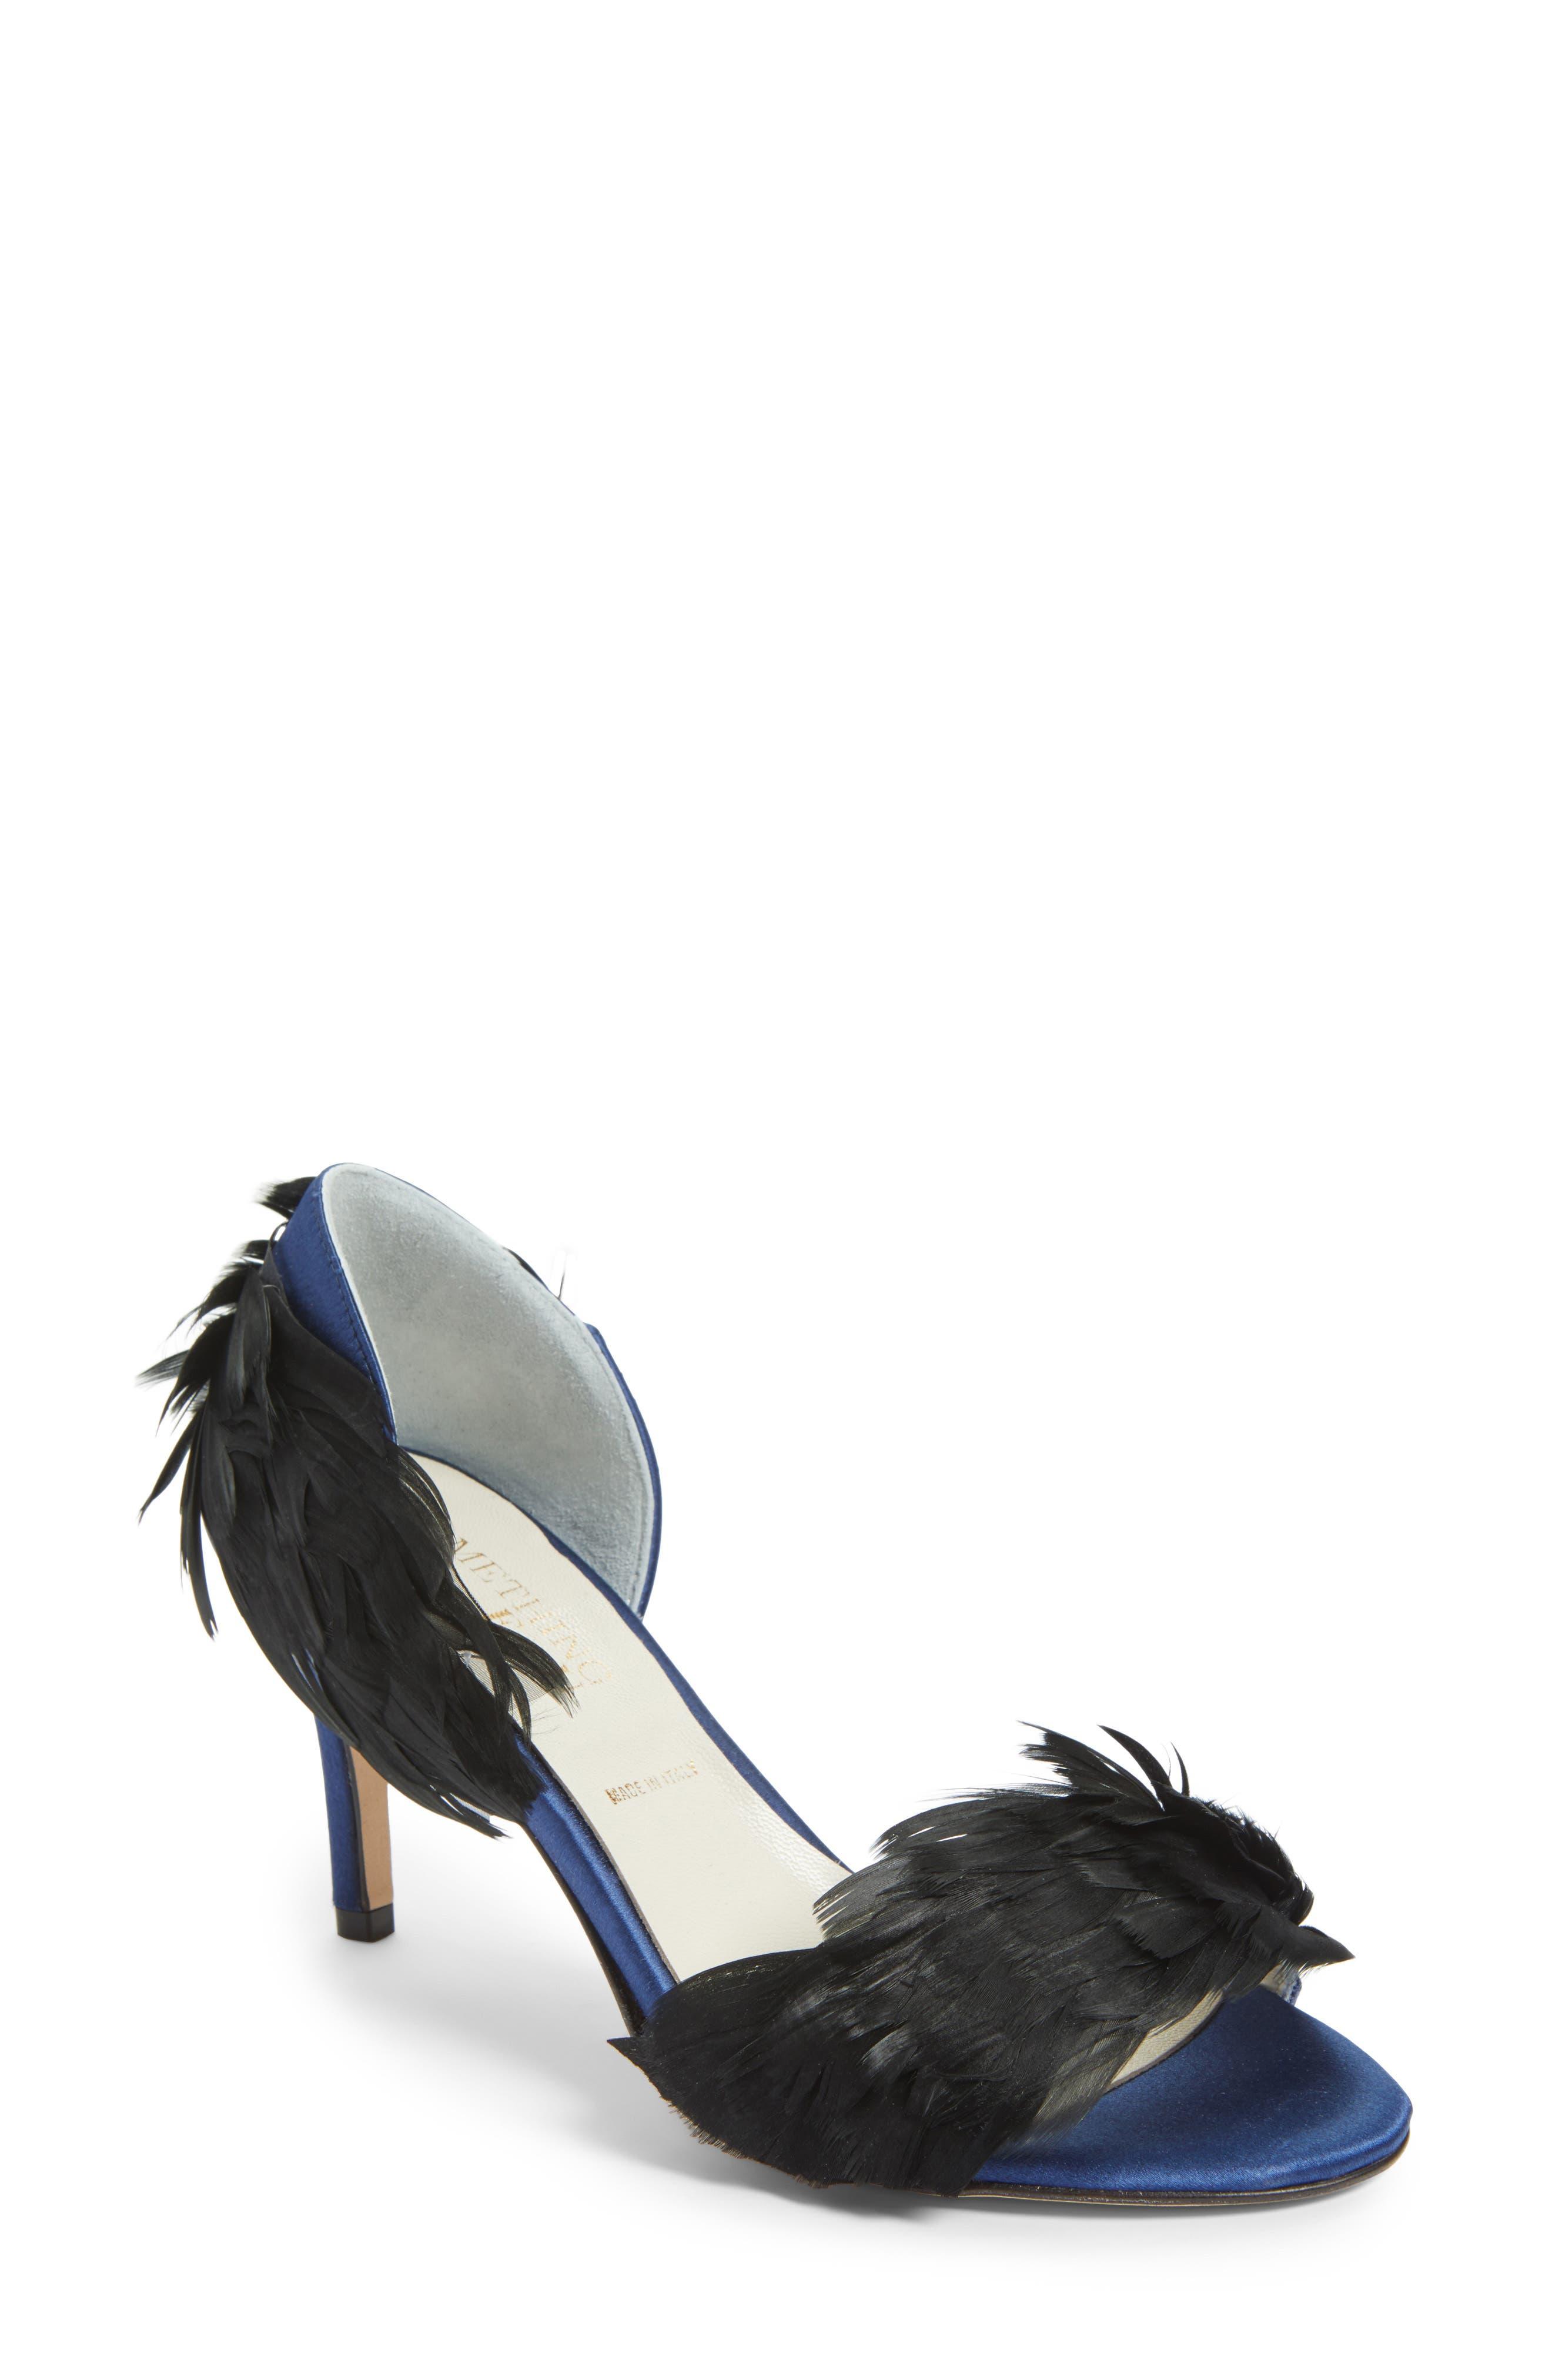 Gigi d'Orsay Sandal,                         Main,                         color, NAVY SATIN